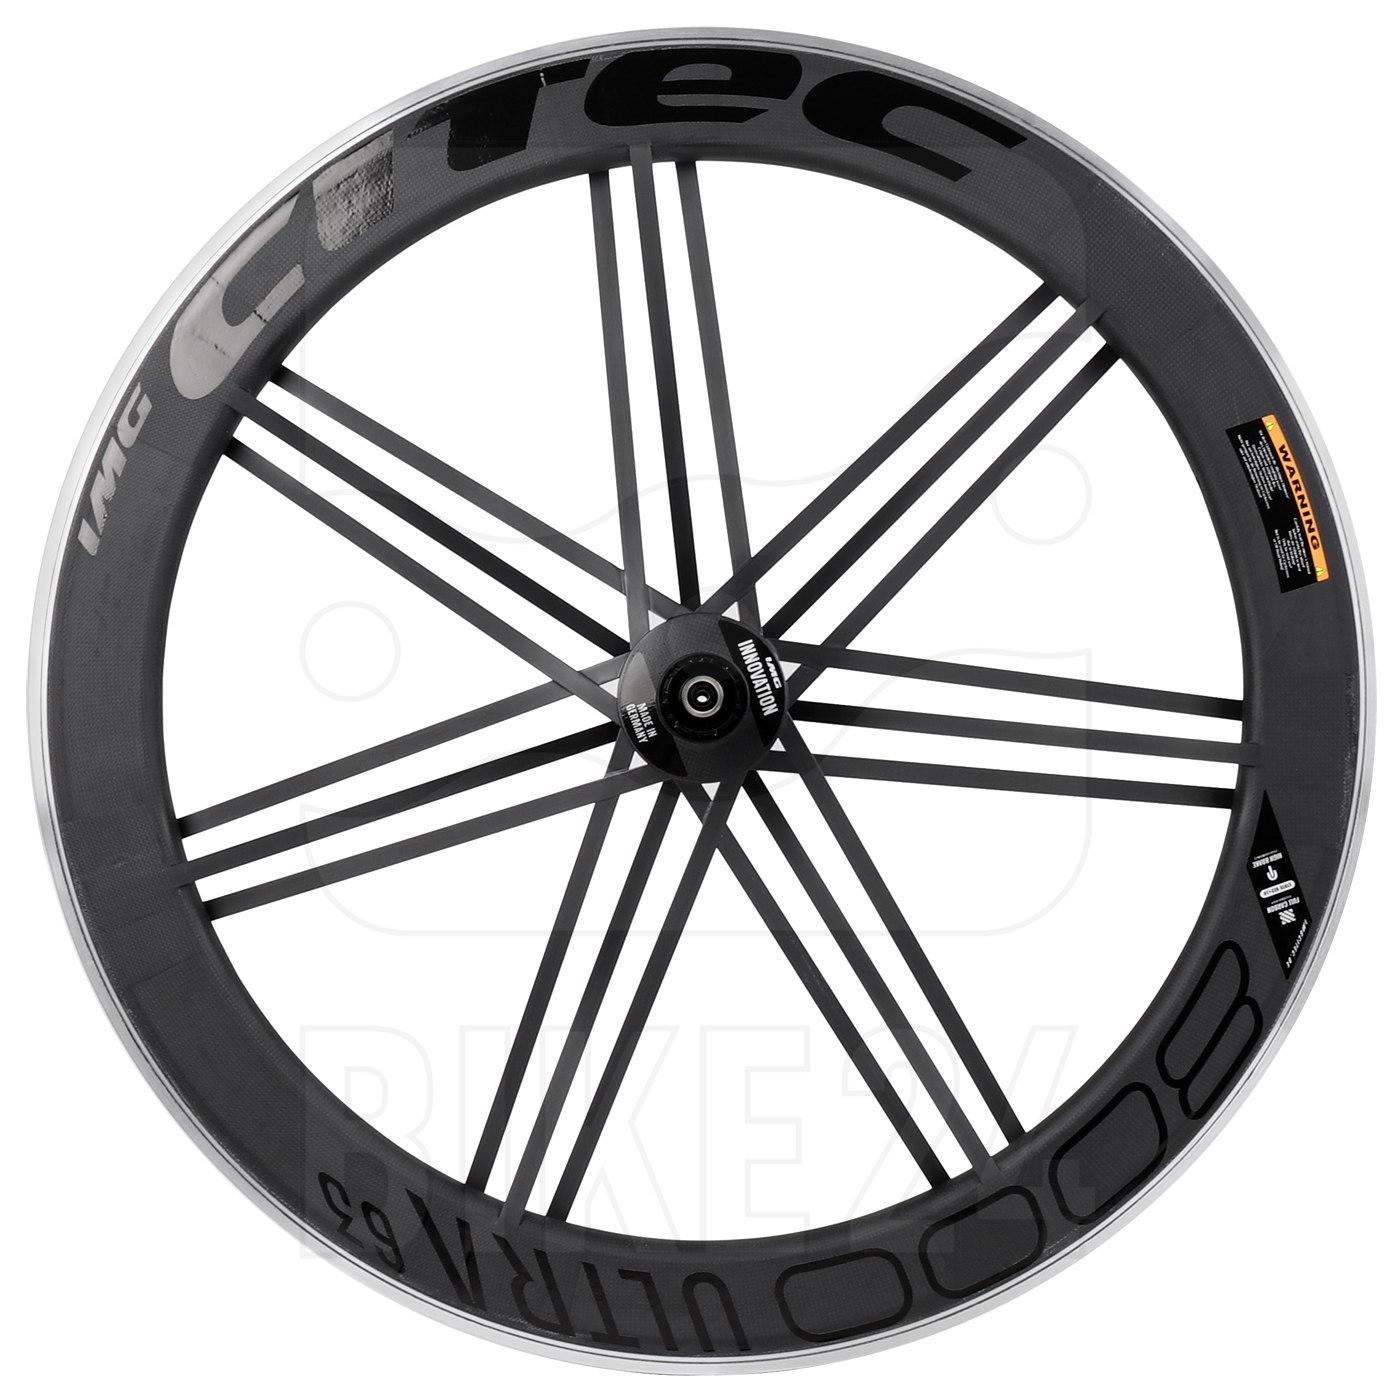 CITEC 8000 SL / 63 Ultra 28 Inch Rear Wheel - Clincher - 10x130mm QR - black